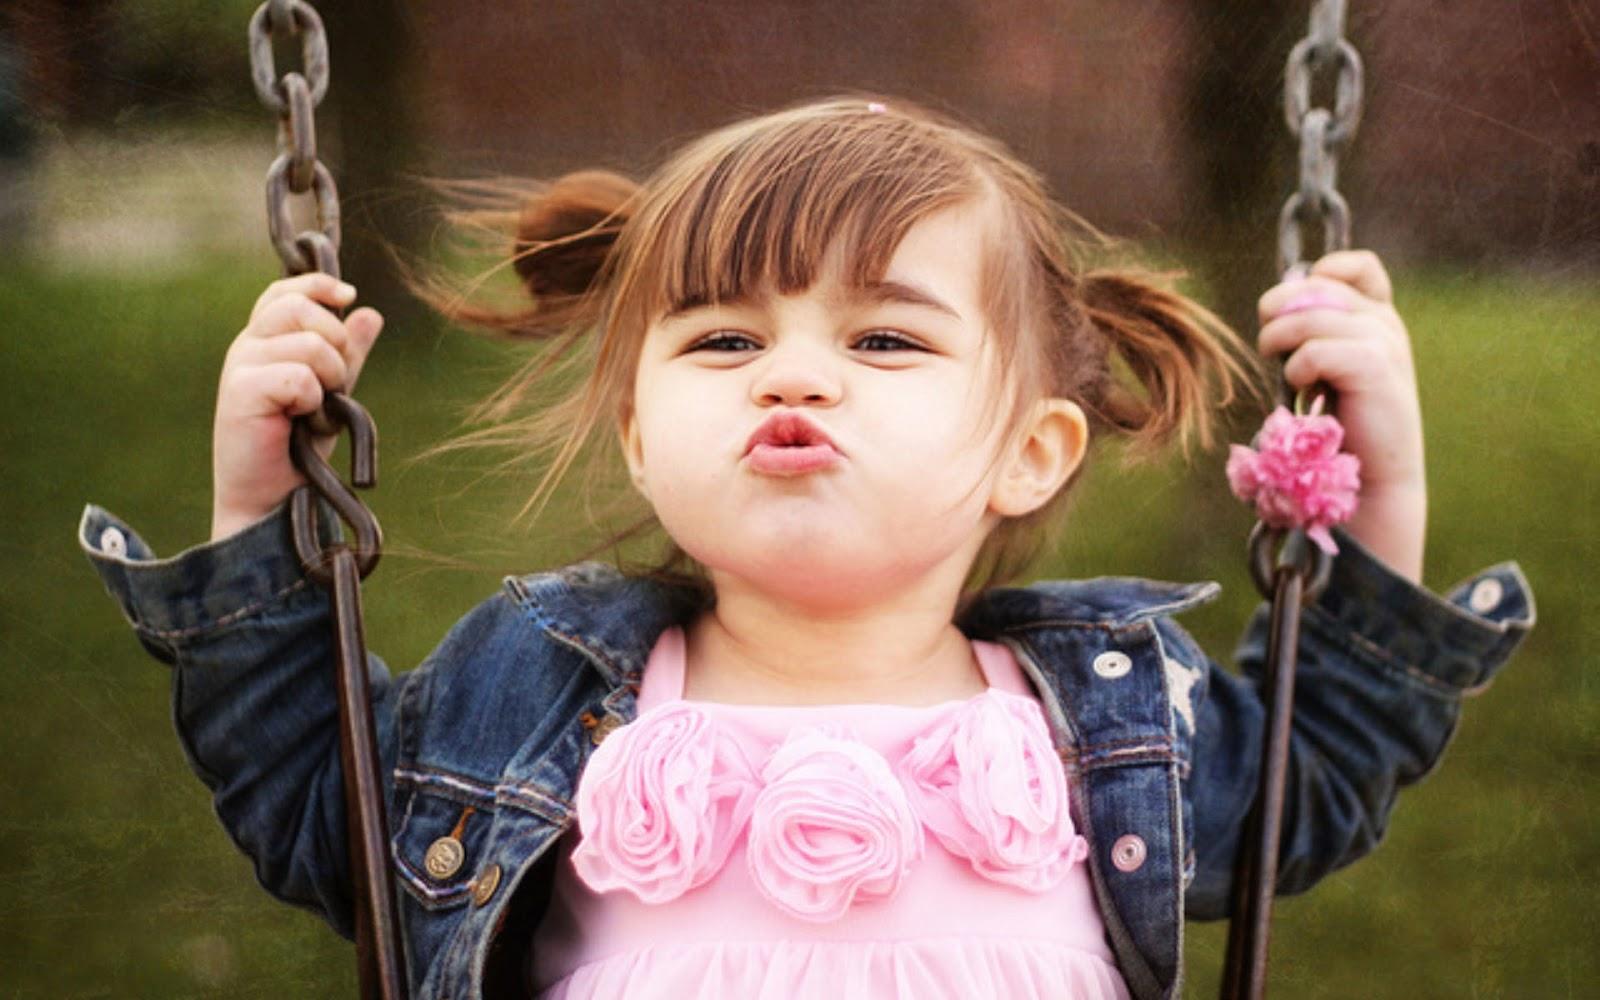 cute little baby girl swing and kiss hd wallpaper | cute little babies